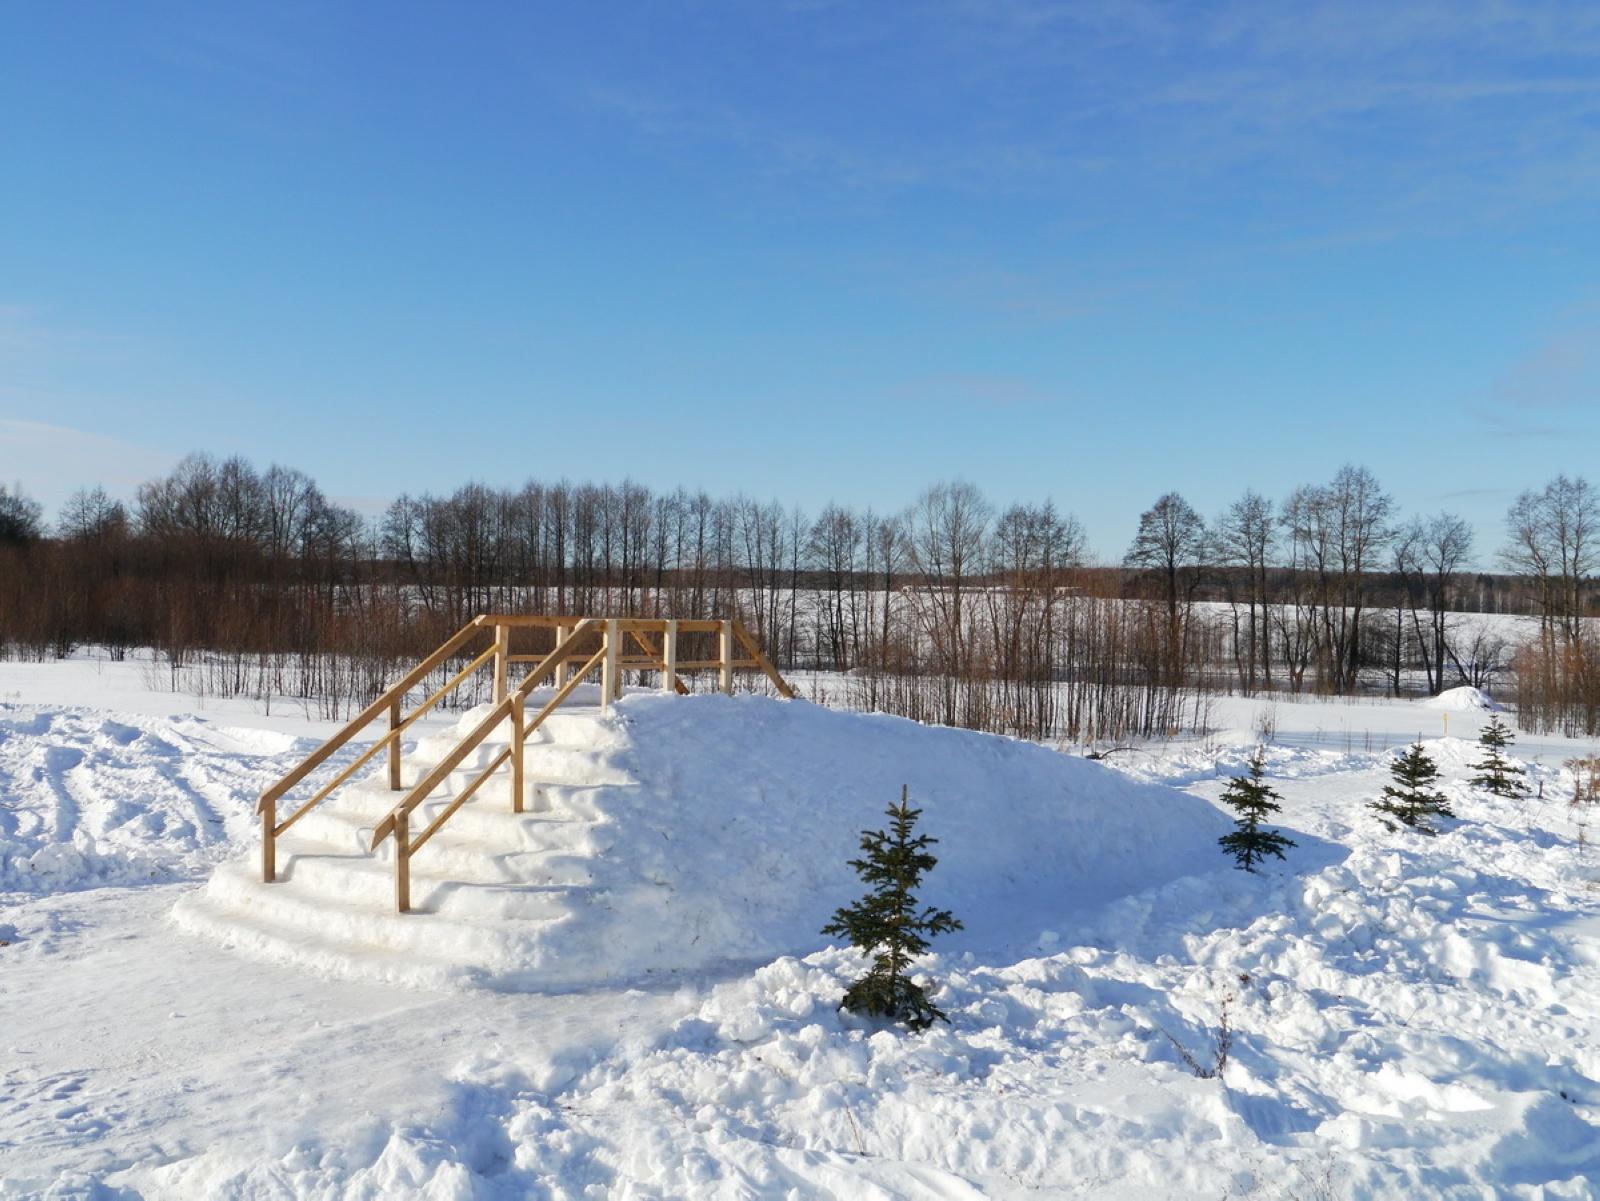 Снежная горка январь 2017